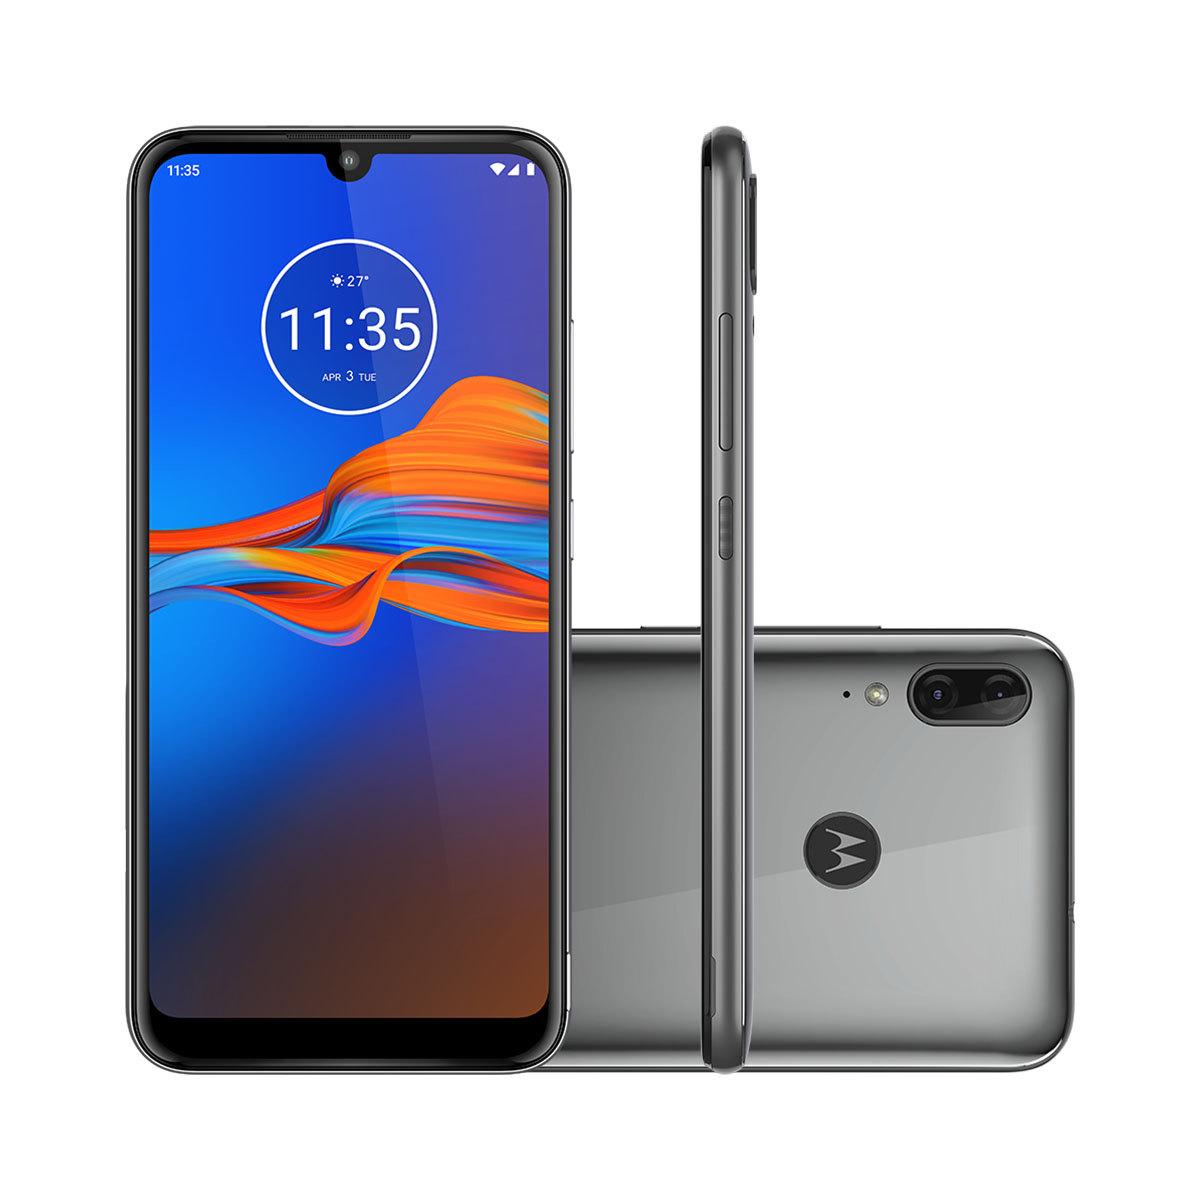 "Smartphone Motorola Moto E6 Plus Cinza Metálico 64GB 6.1"" Android 9.0 Pie XT2025-1"